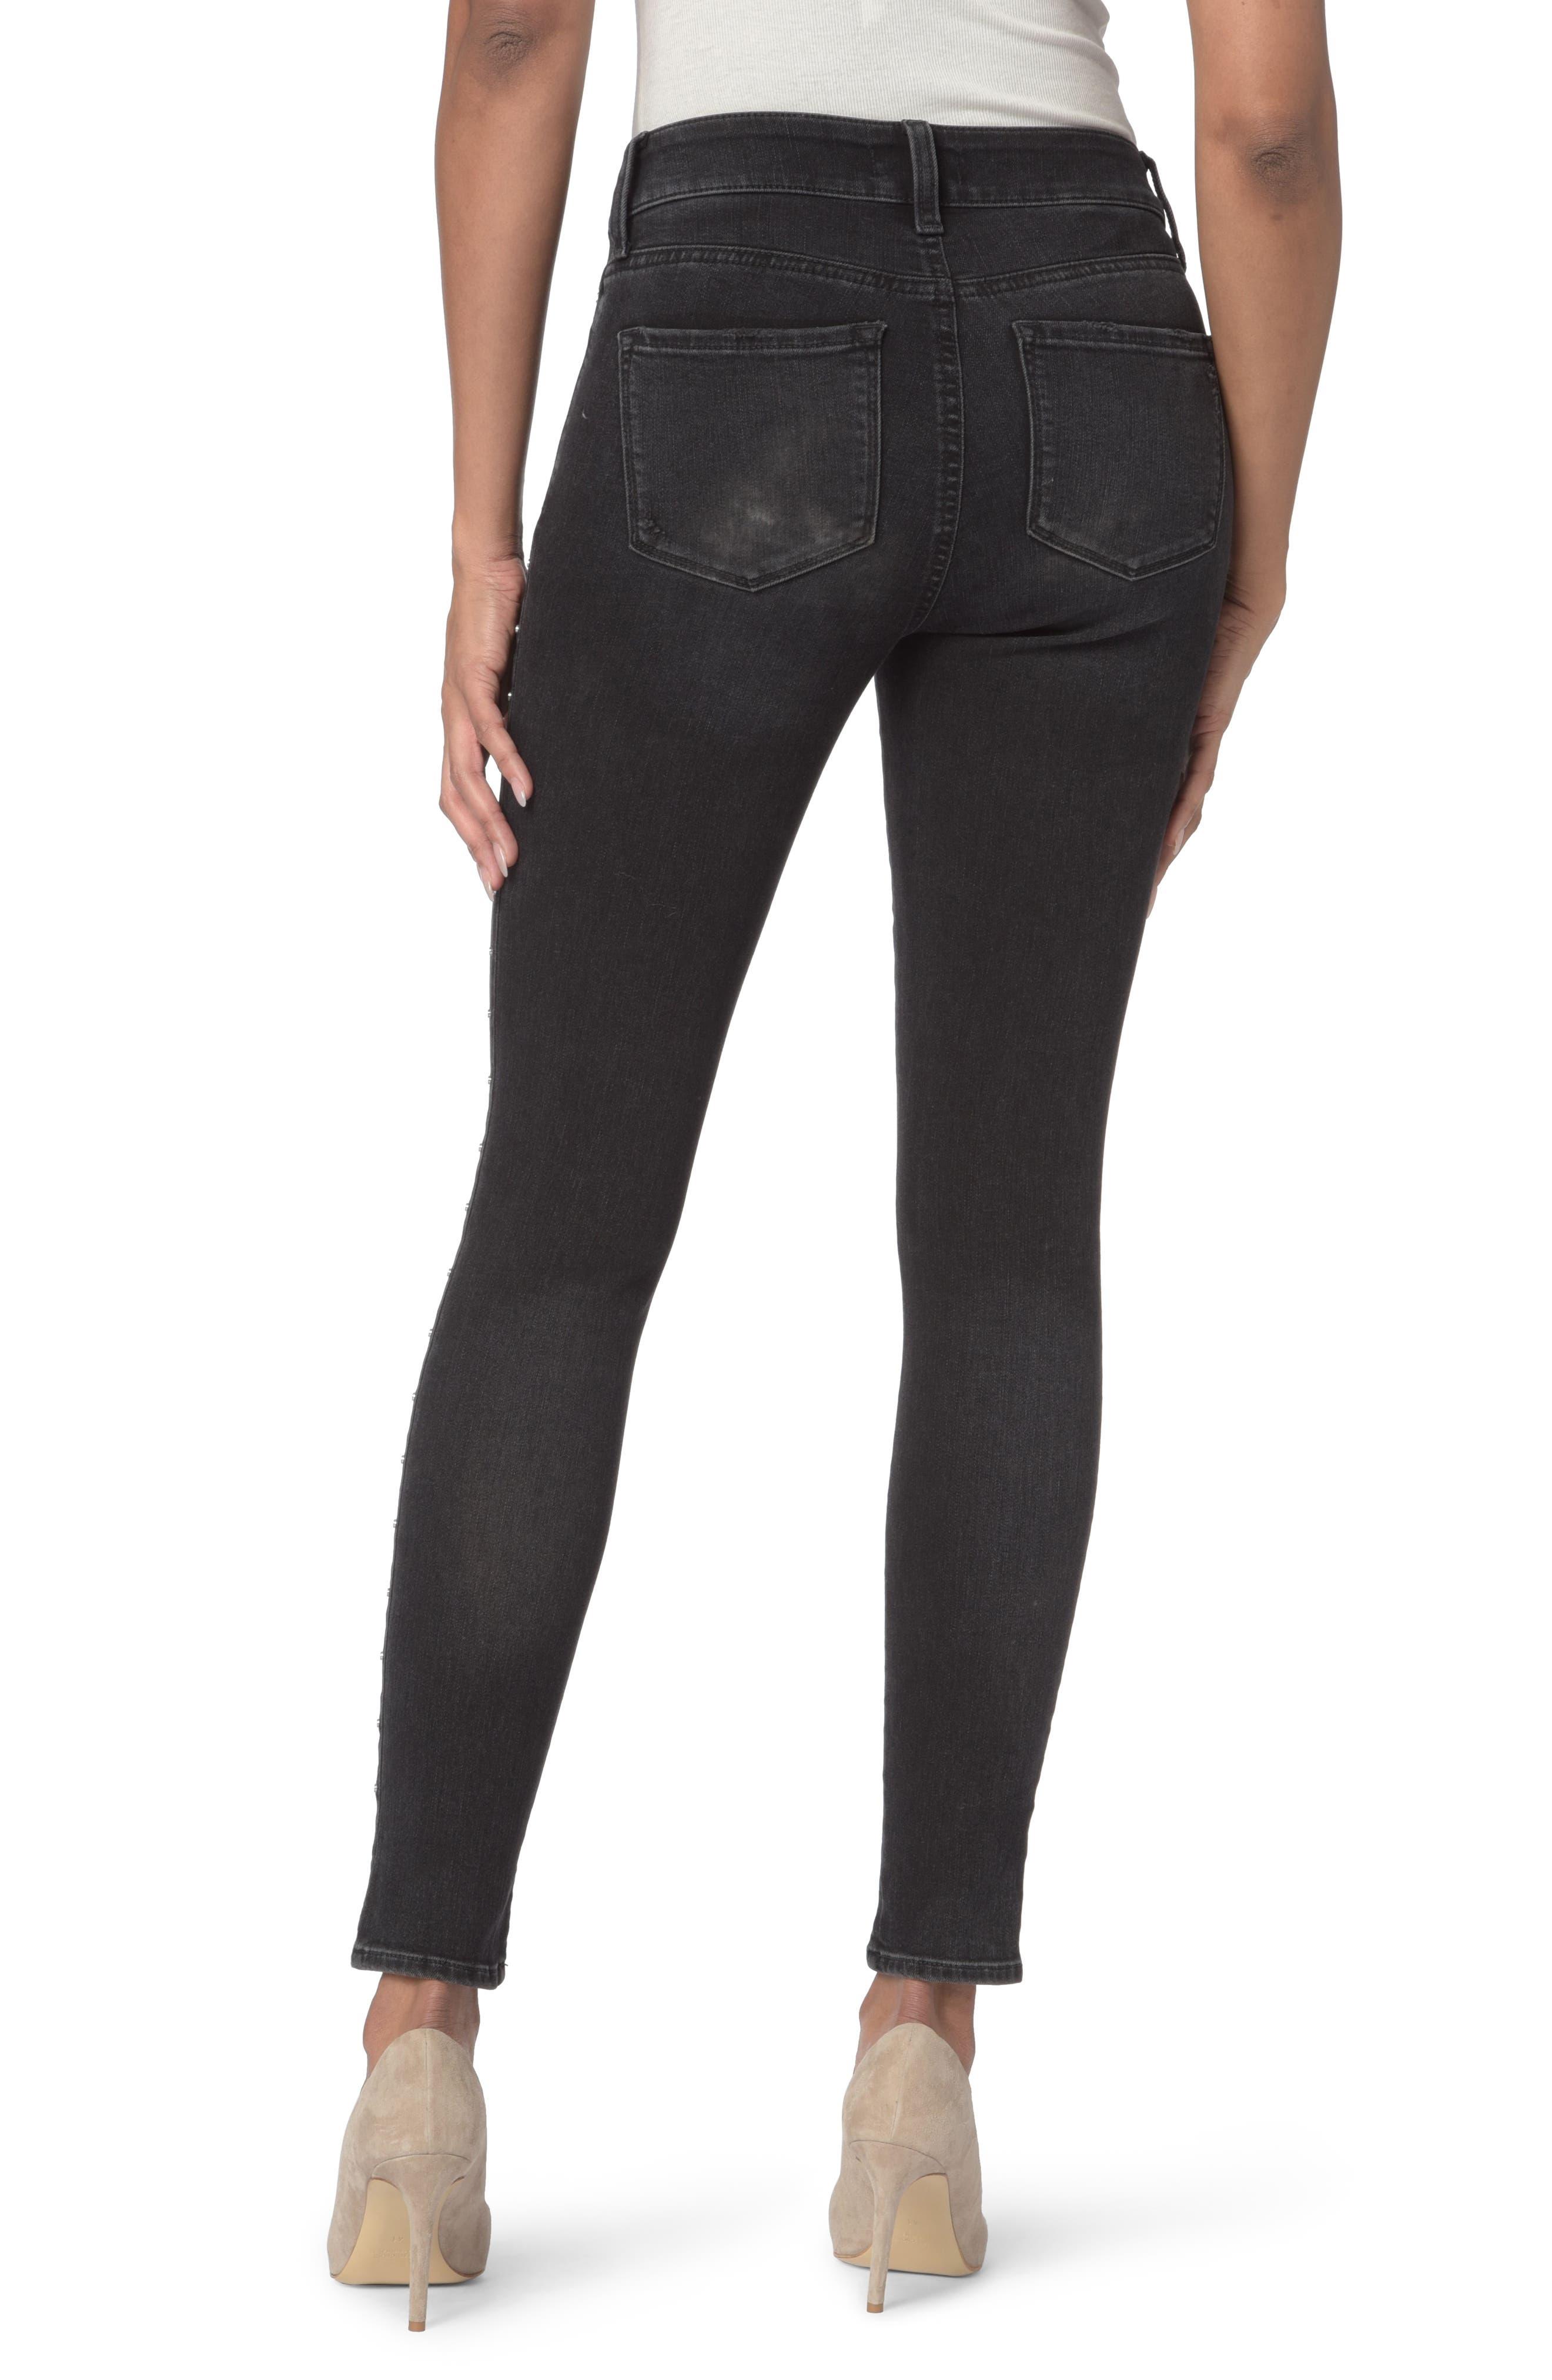 Alternate Image 2  - NYDJ Ami Embellished Stretch Skinny Jeans (Campaign) (Regular & Petite)